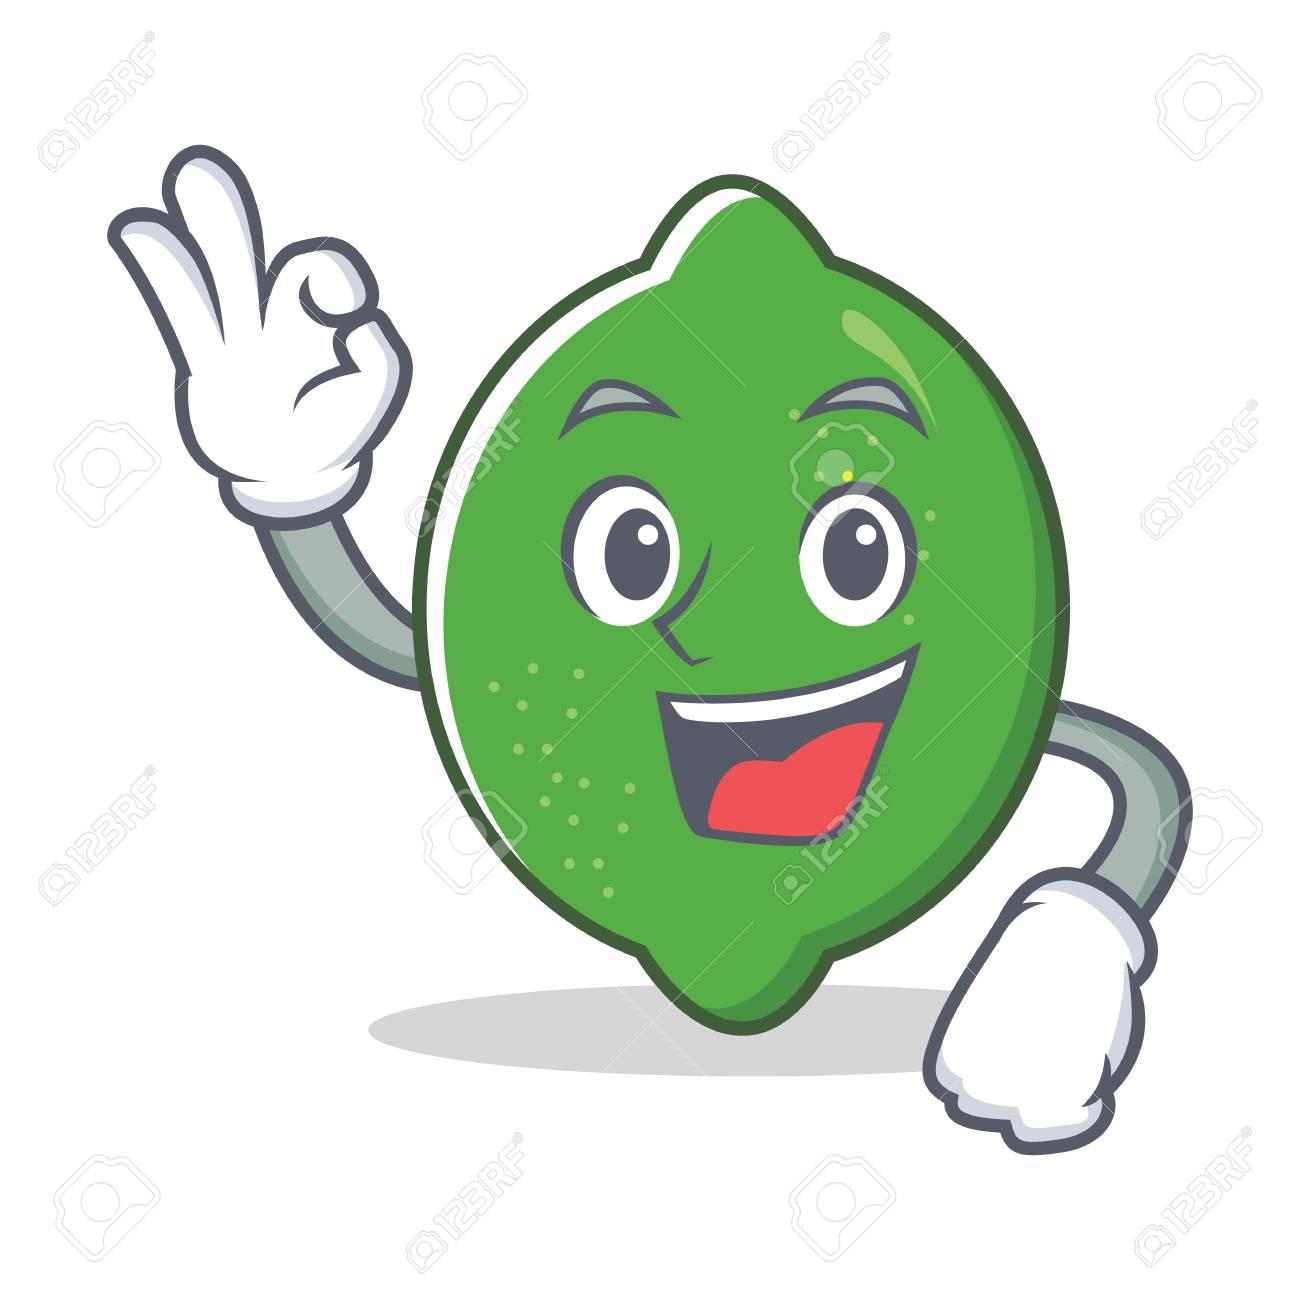 Okay lime character cartoon style - 93508276